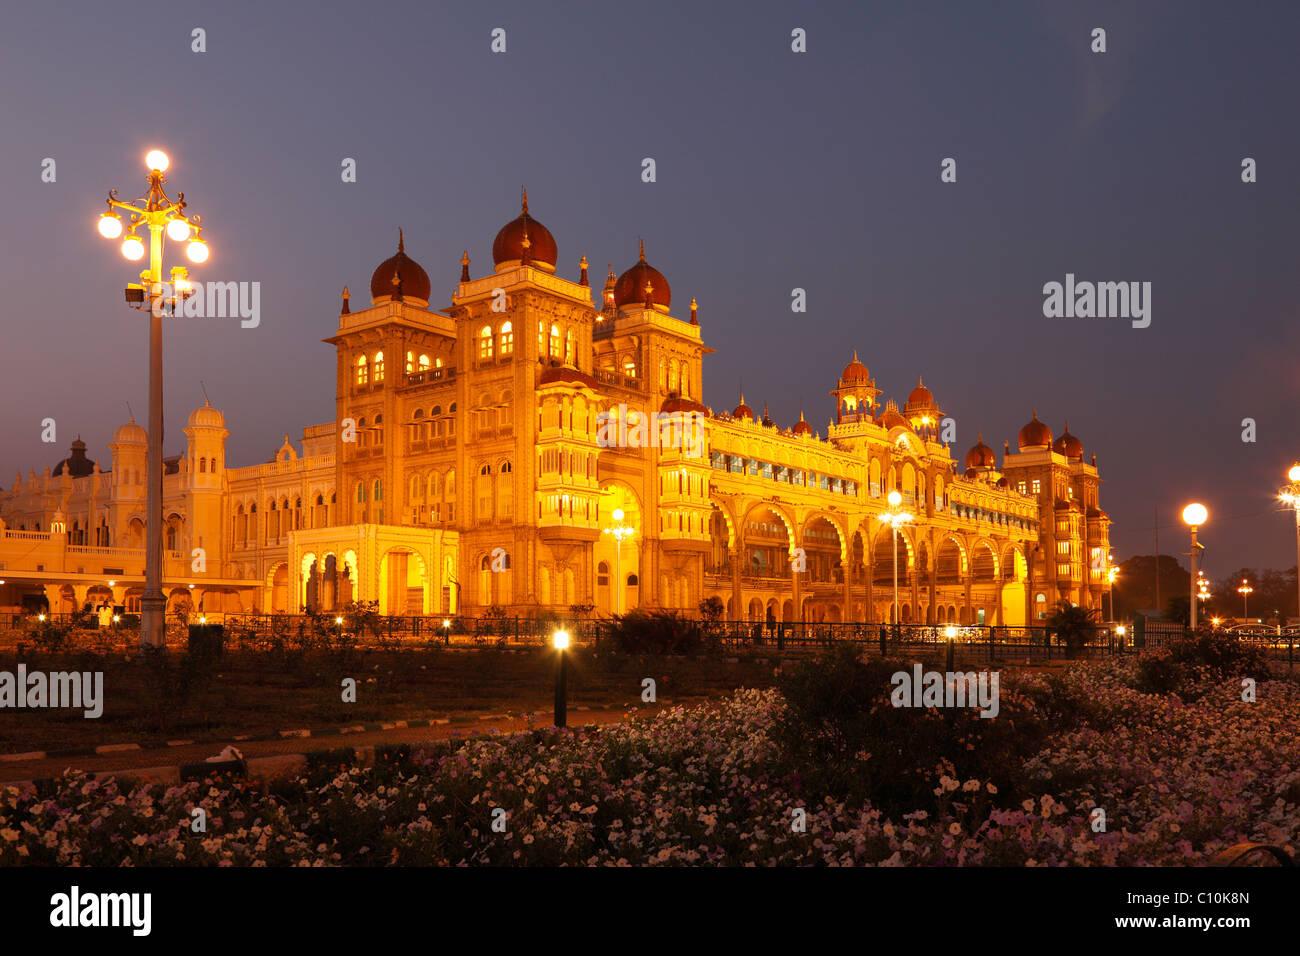 Maharaja Palace, Mysore Palast, Beleuchtung in der Nacht, Mysore, Karnataka, Südindien, Indien, Südasien, Stockbild